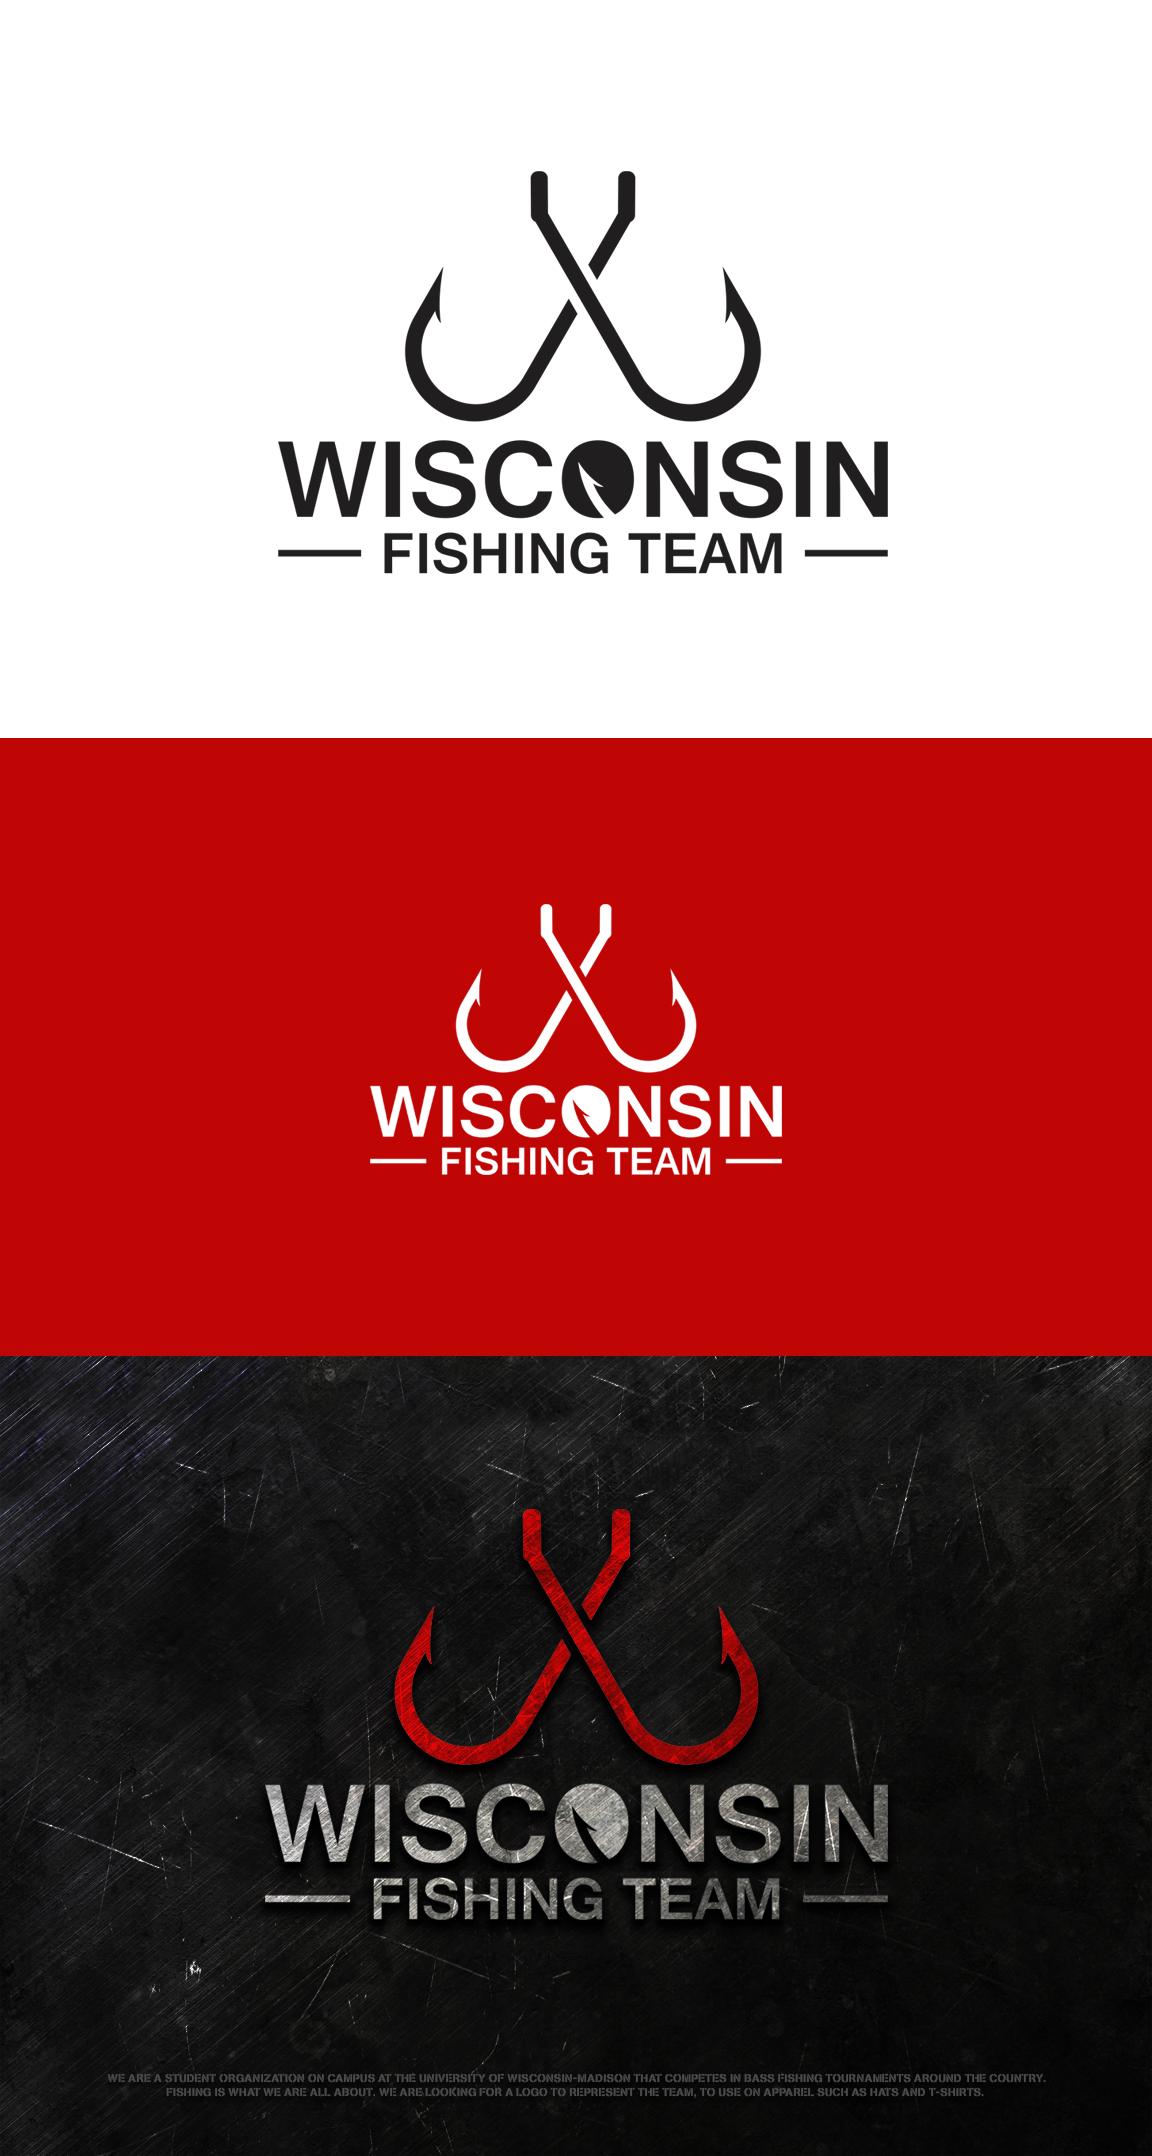 Wisconsin Fishing Team Logo Contest